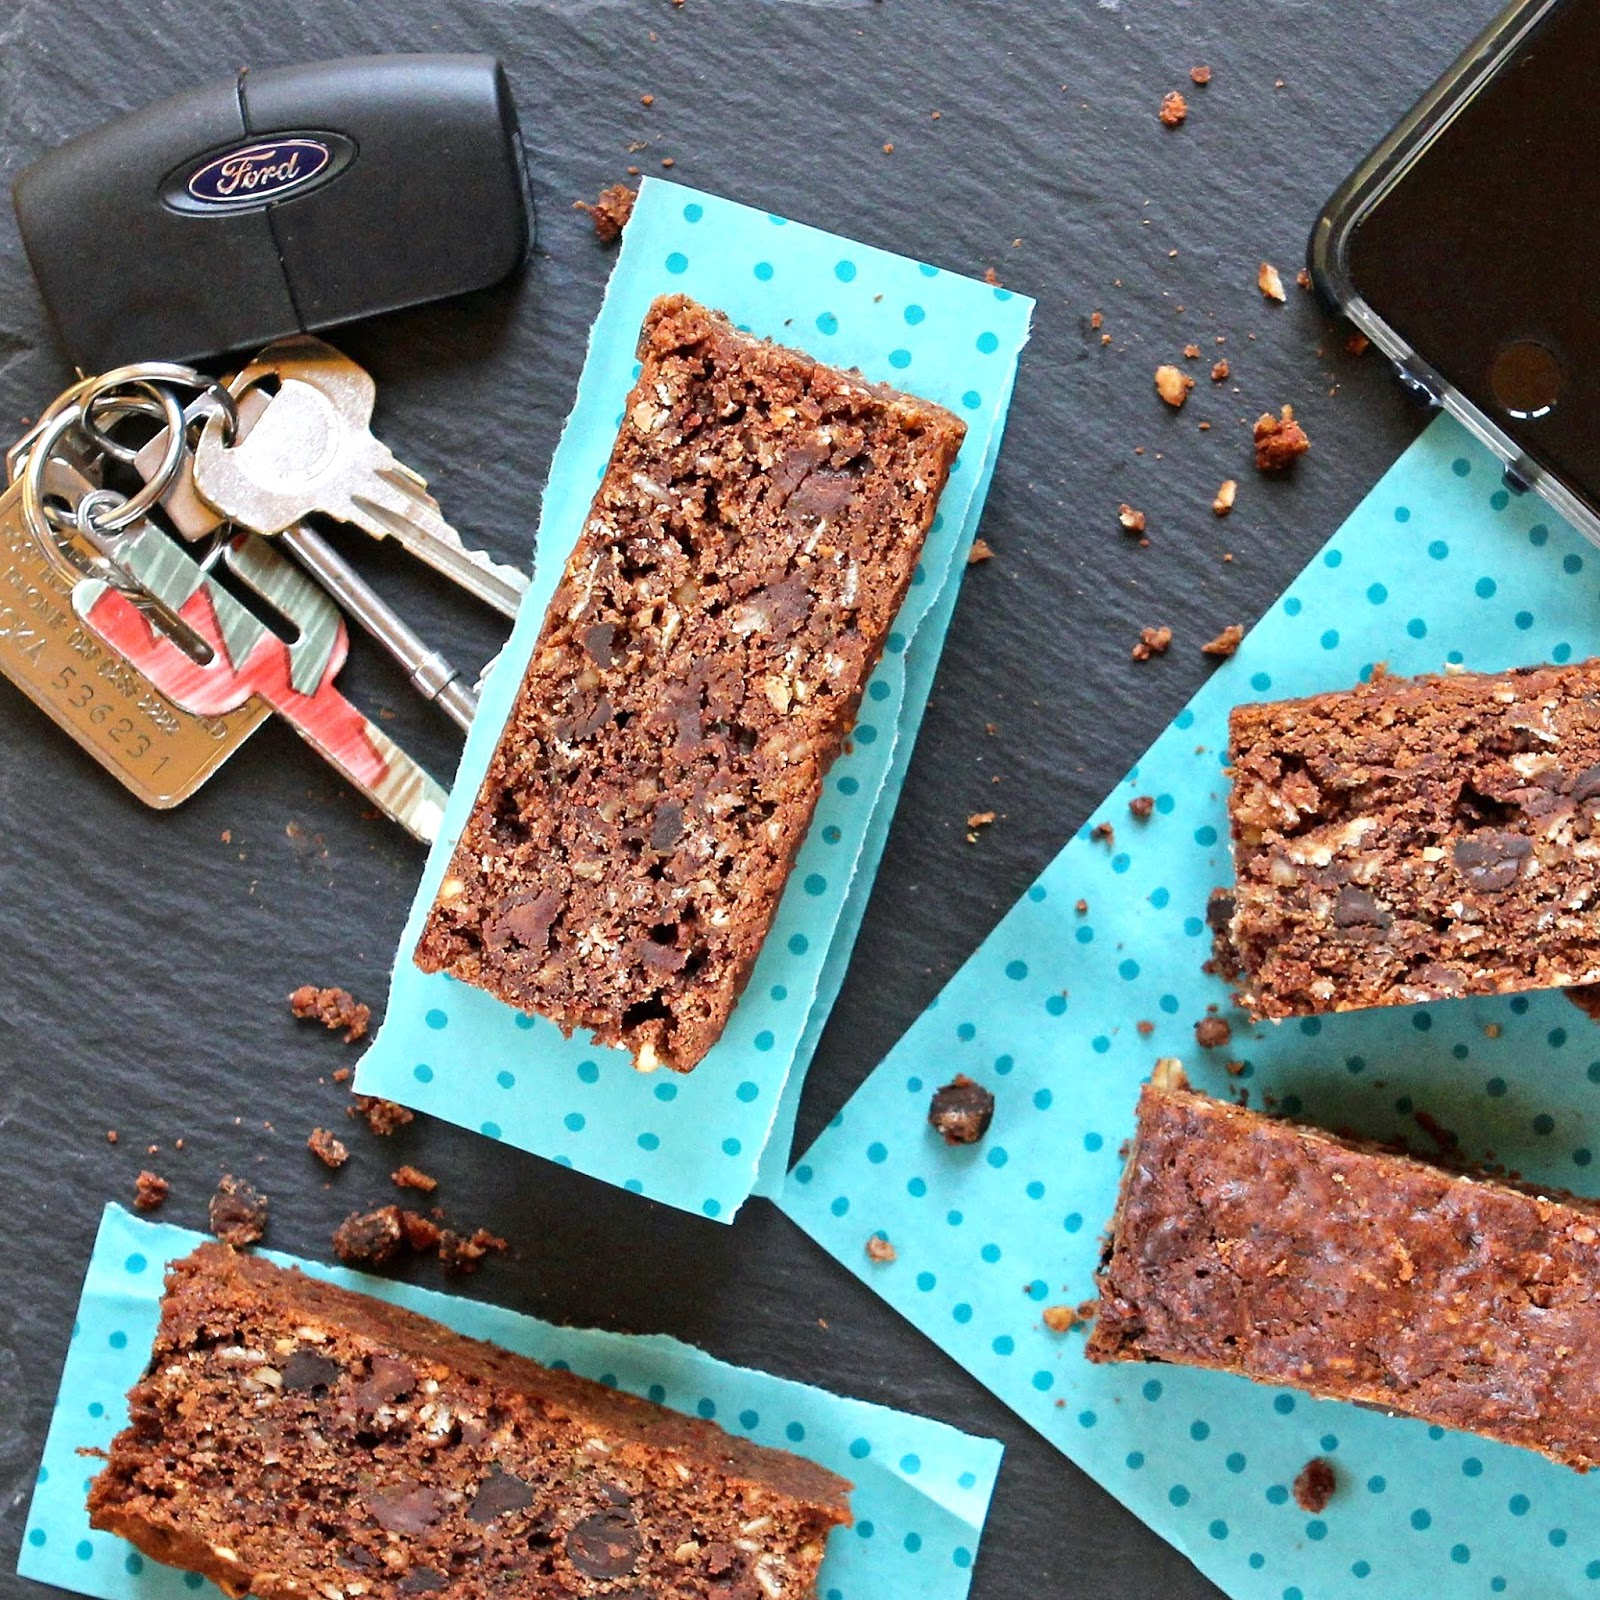 Gluten Free Alchemist: Cacao-Courgette (Zucchini) Breakfast Cake ...